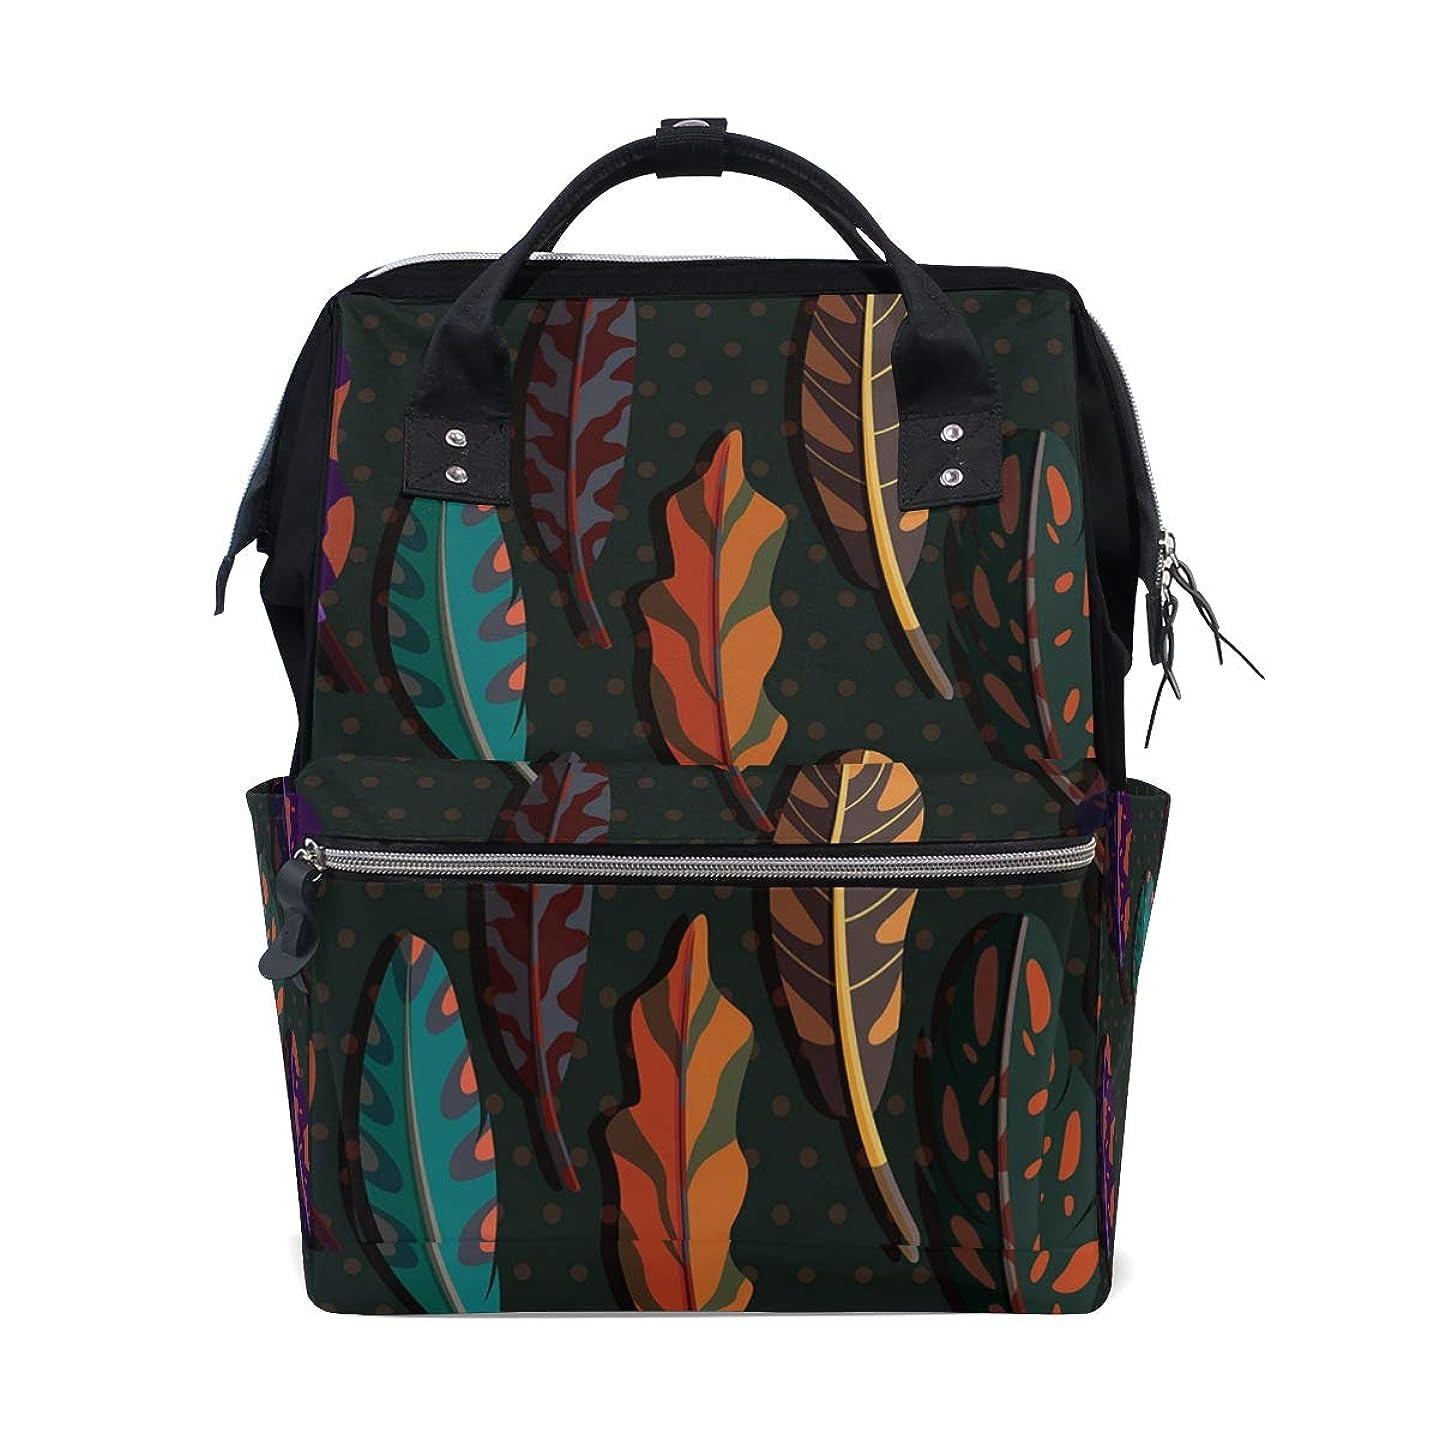 Boho Feather School Backpack Large Capacity Mummy Bags Laptop Handbag Casual Travel Rucksack Satchel For Women Men Adult Teen Children